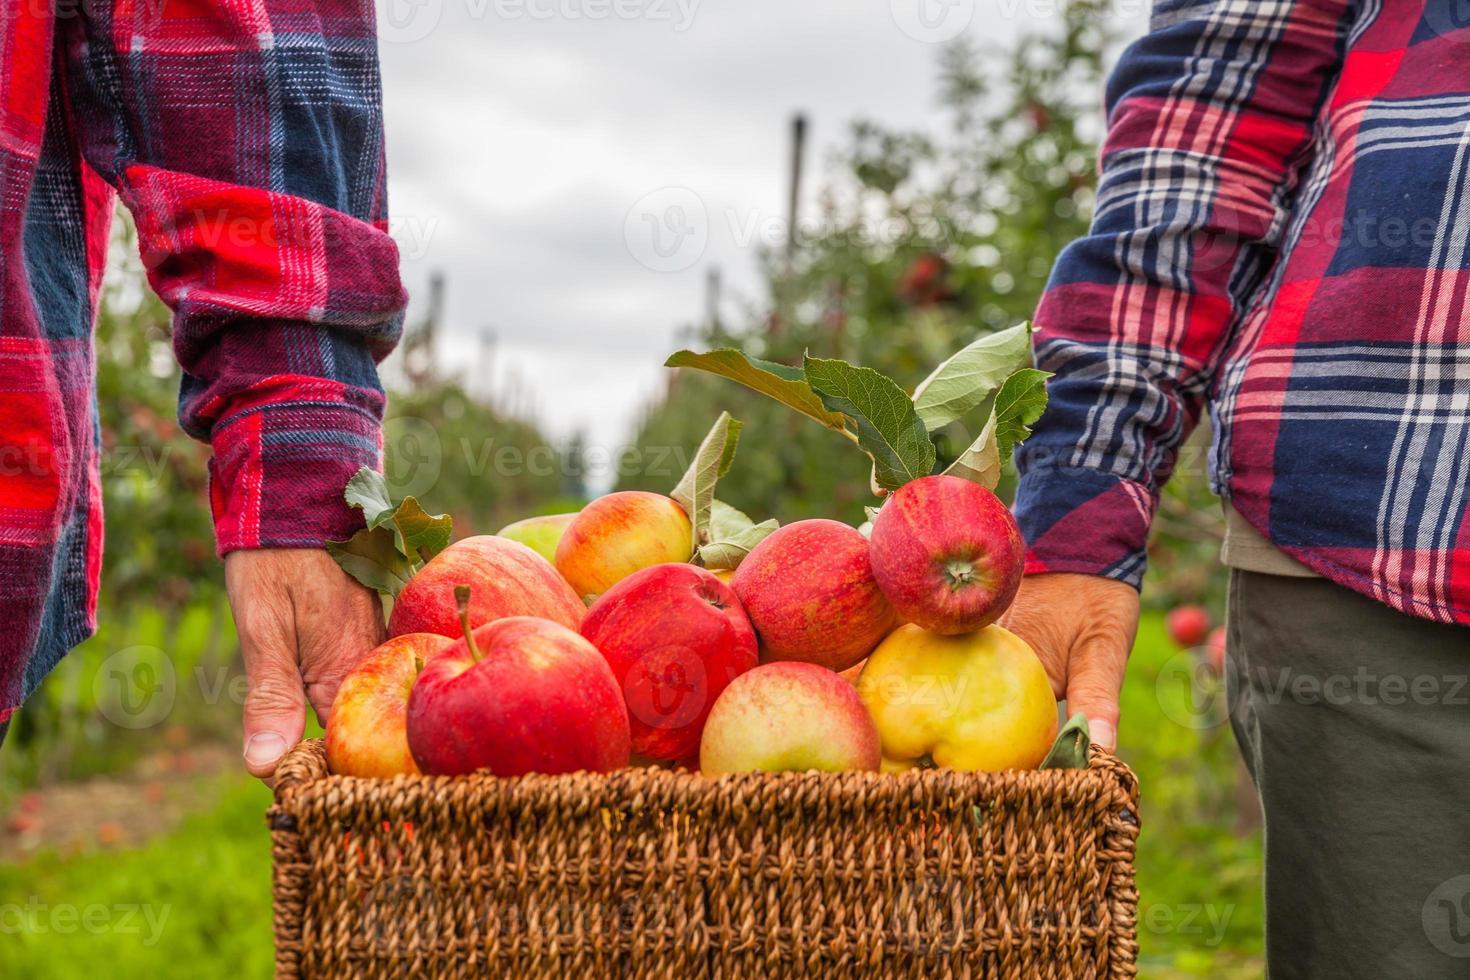 aantal appels op het Bodenmeer Duitsland foto